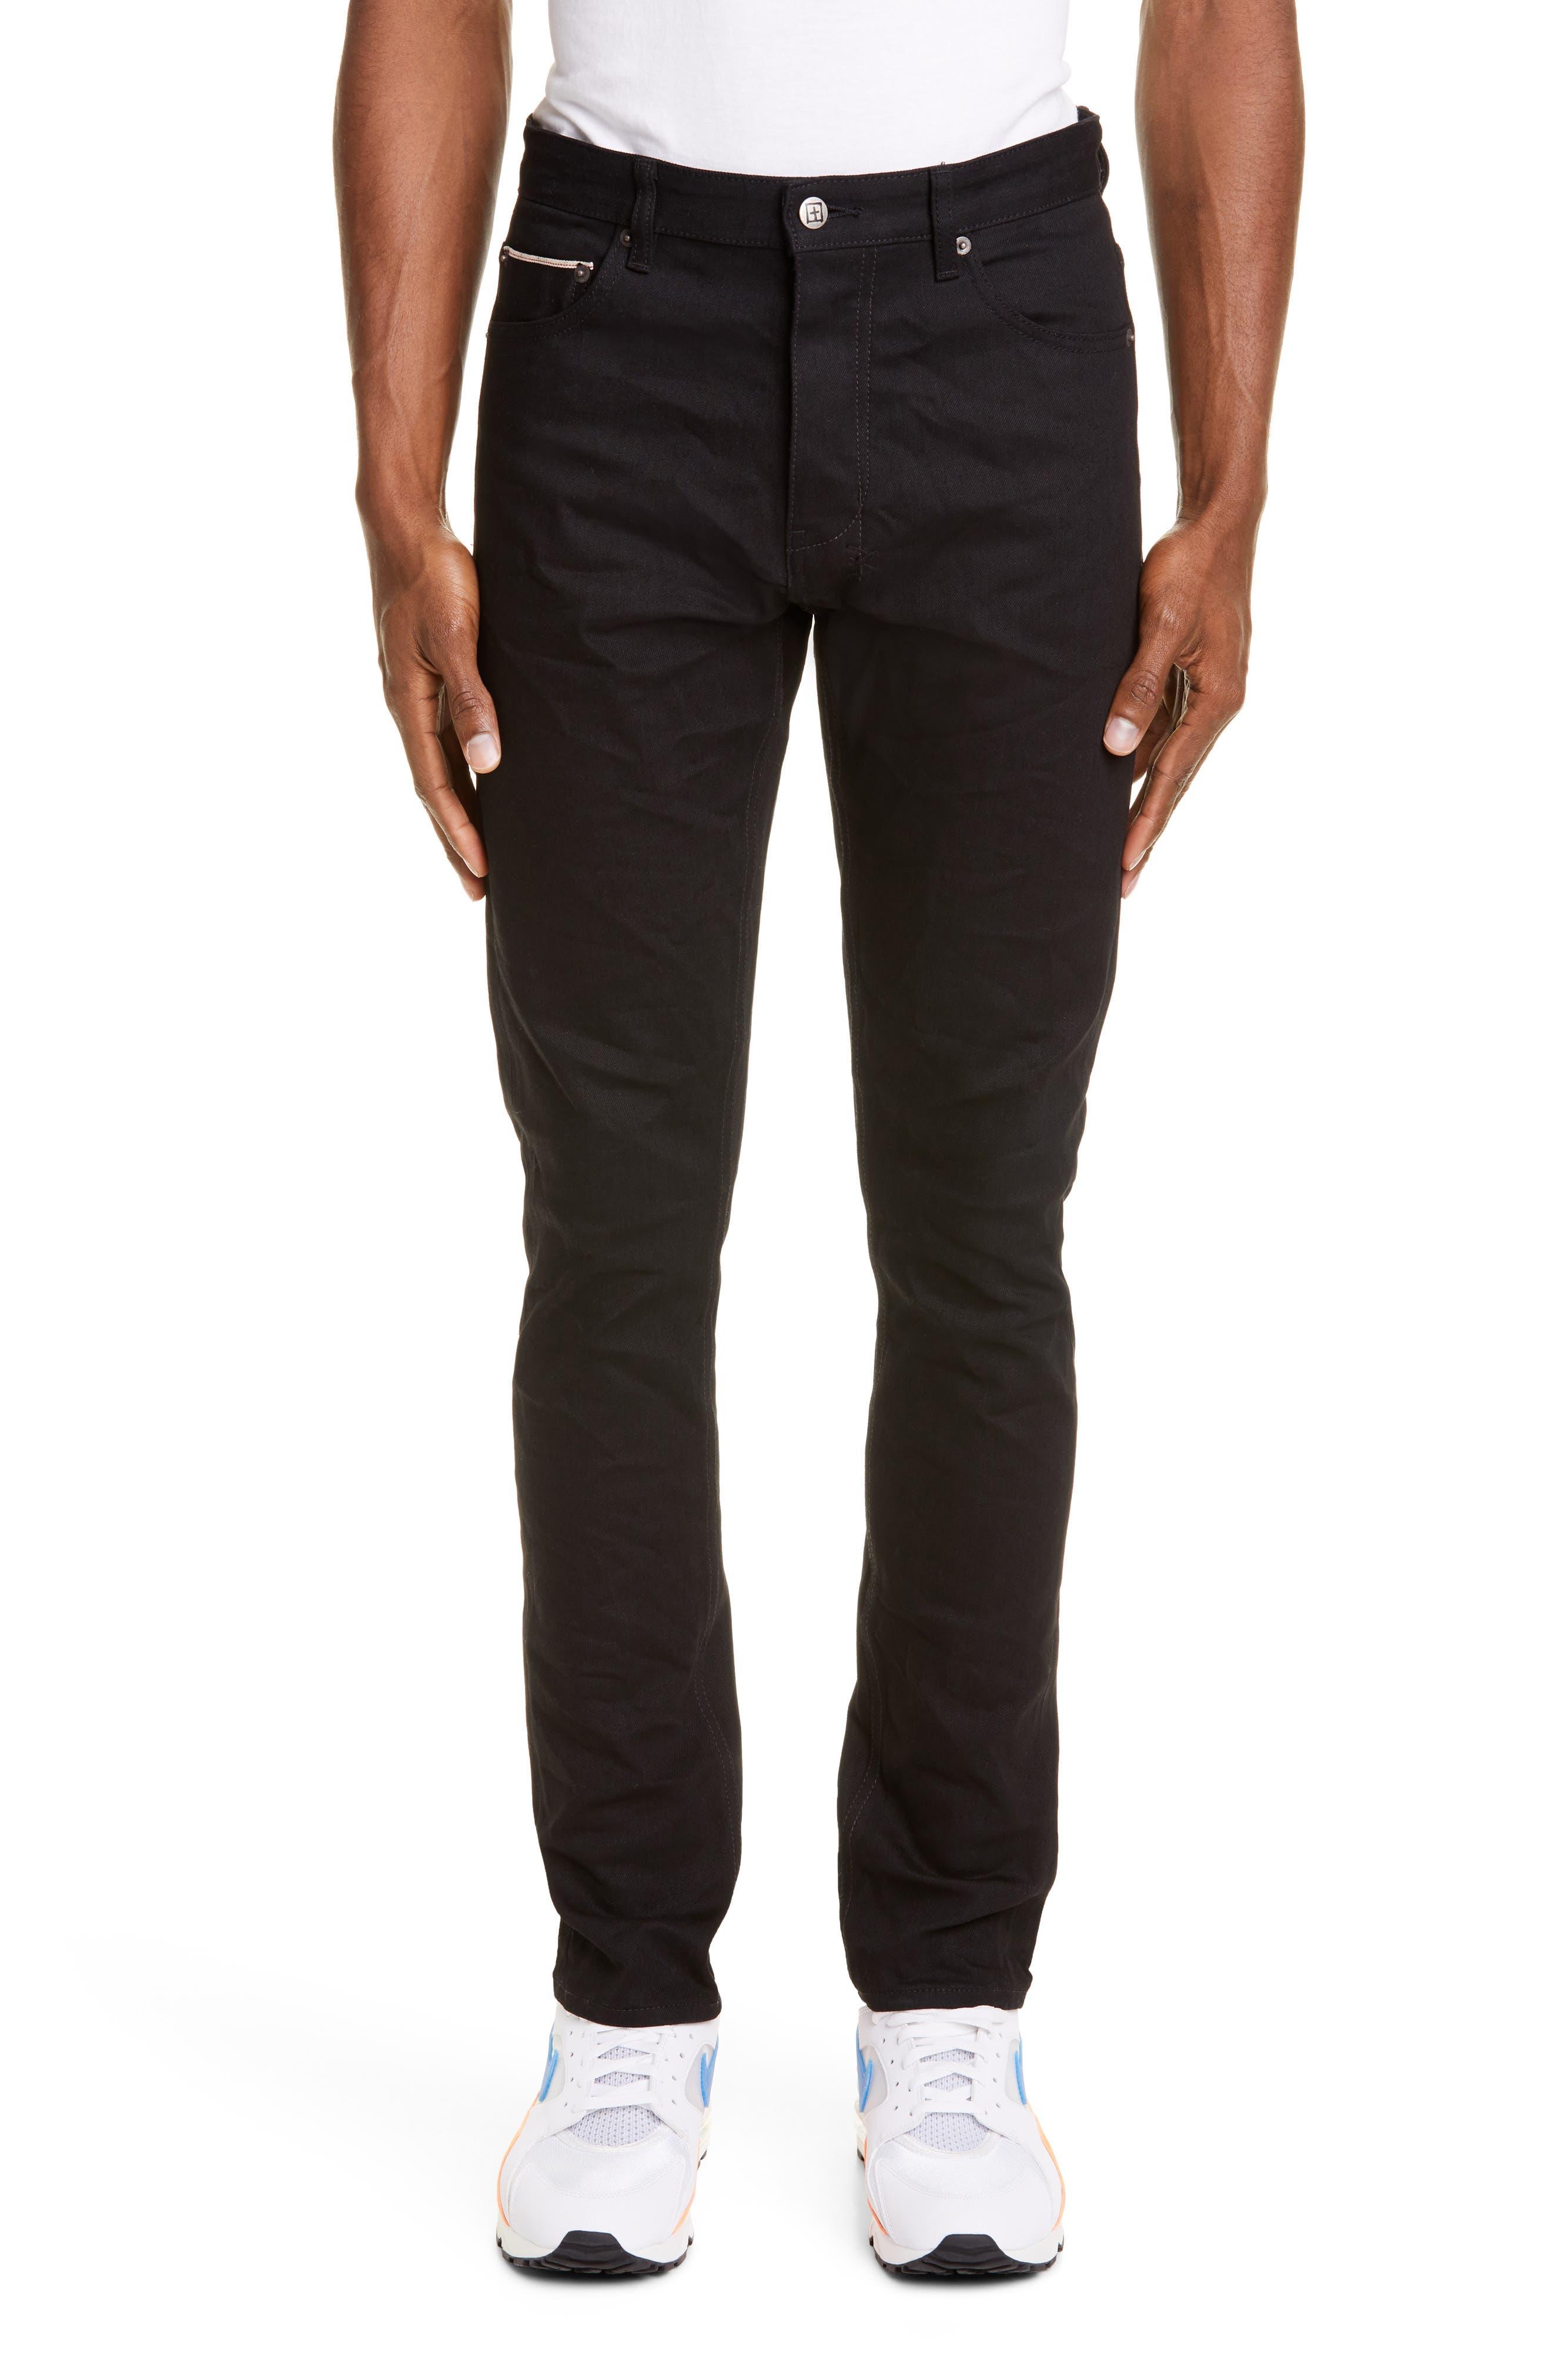 Chitch Black Skinny Fit Selvedge Jeans by Ksubi